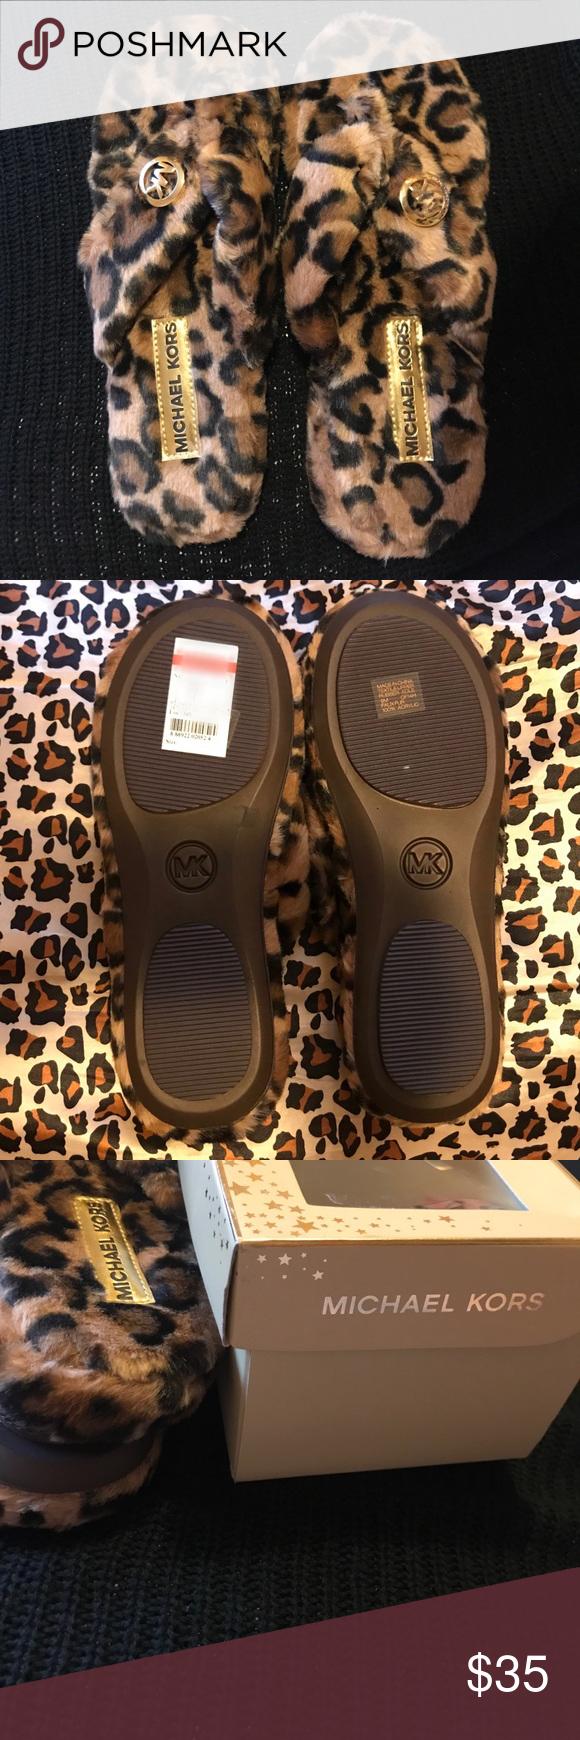 28c3618a035c Michael Kors house shoes Michael Kors leopard faux fur Jet set MK thong  house shoe size 9M. Brand new with tags. Michael Kors Shoes Slippers